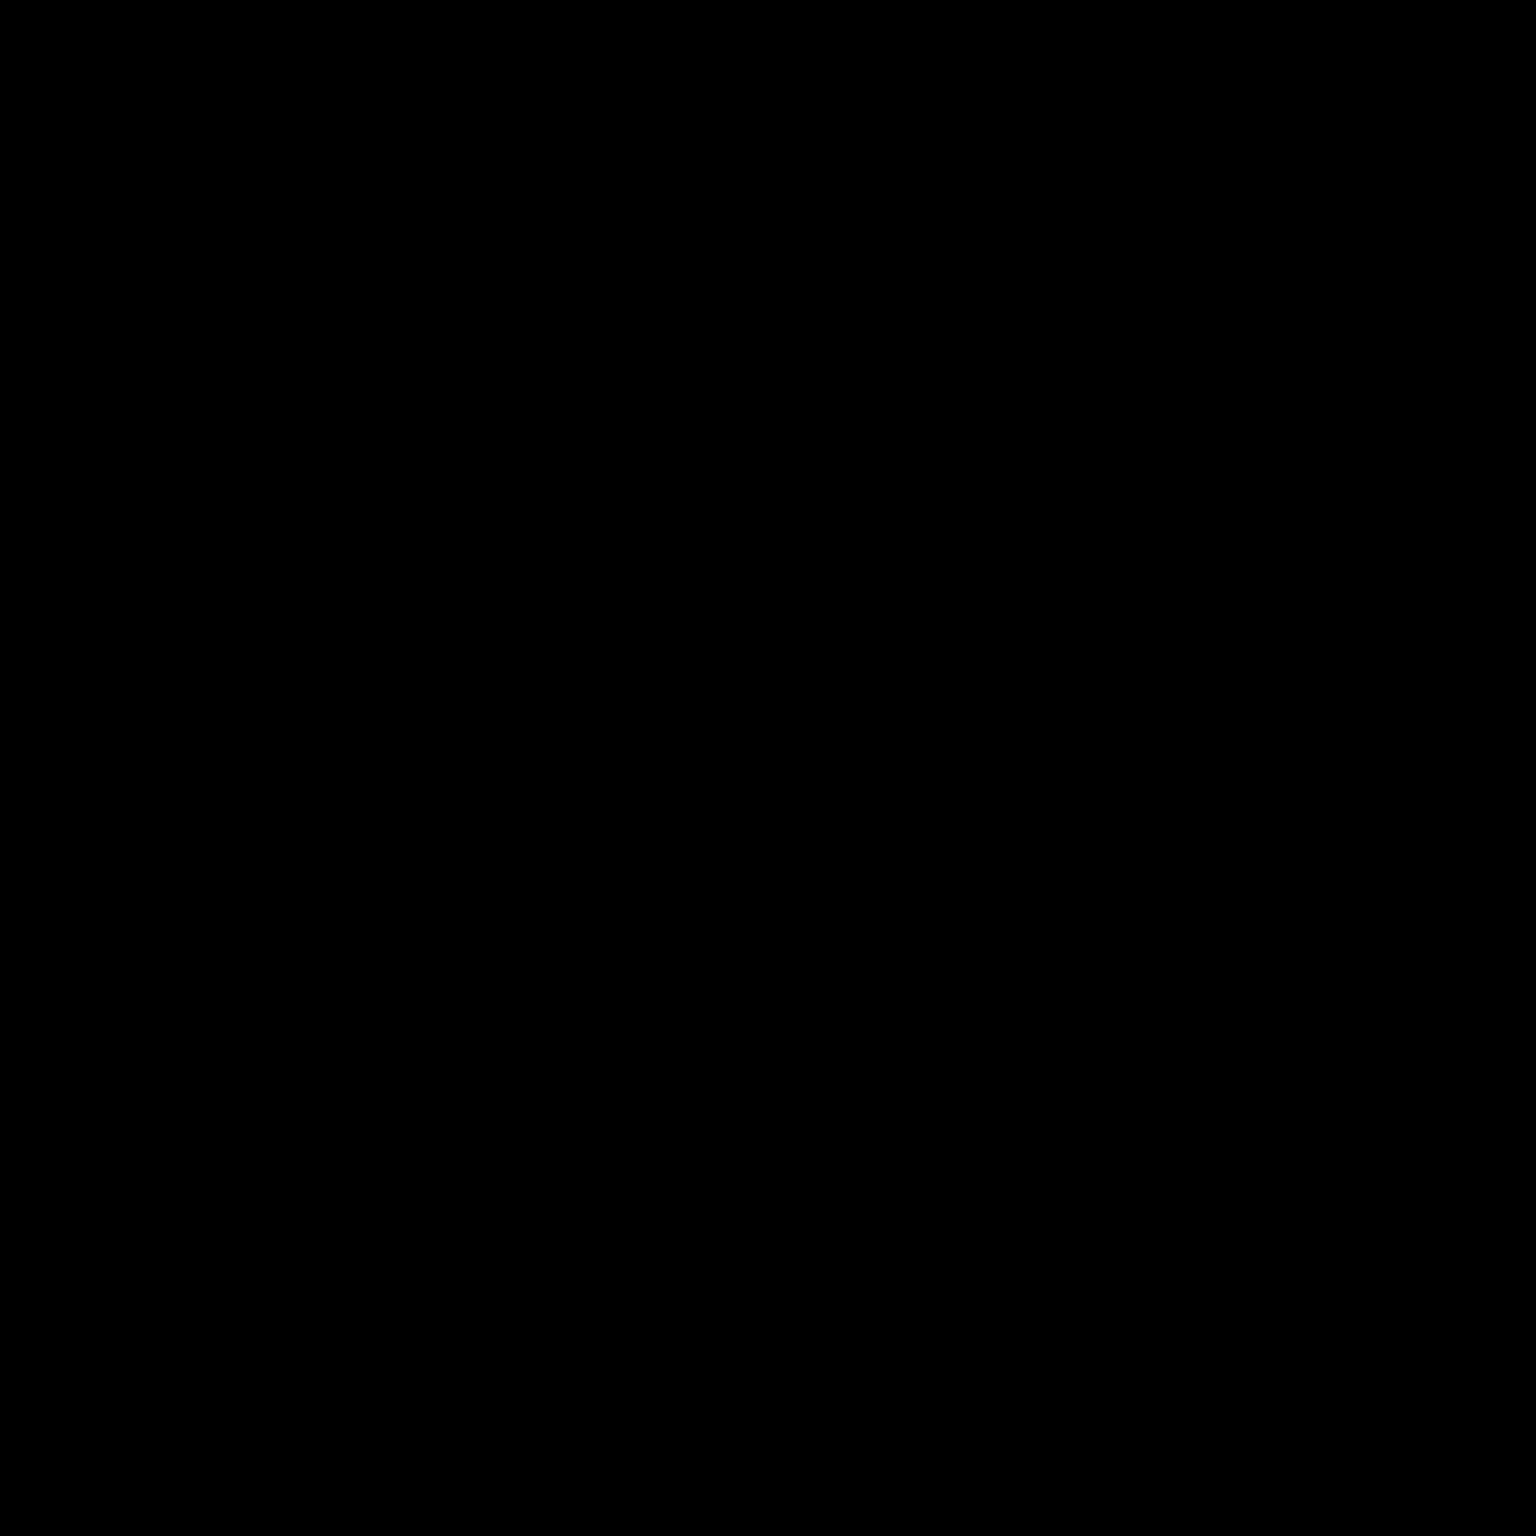 R10 black